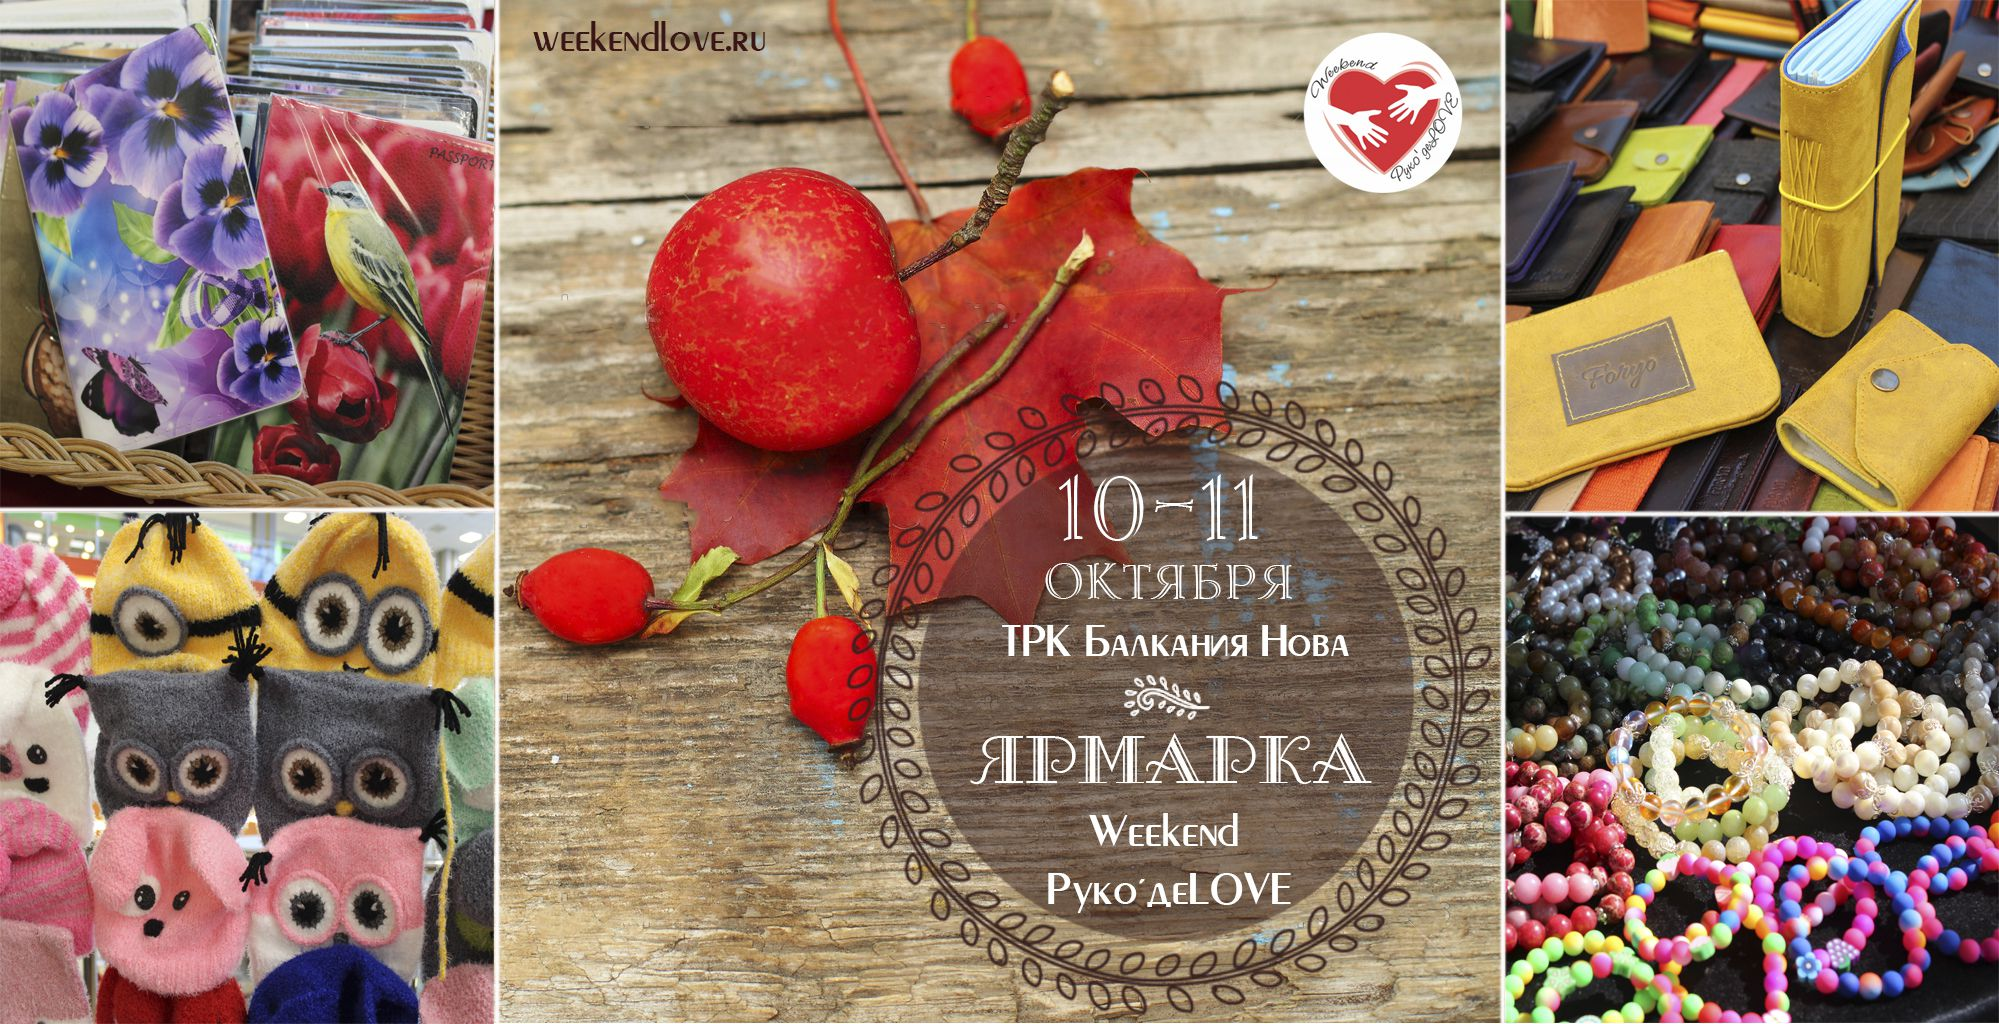 маркет ручная_работа выстfвка weekend_руко'деlove спб handmade галерея_мастеров хэндмейд ярмарка